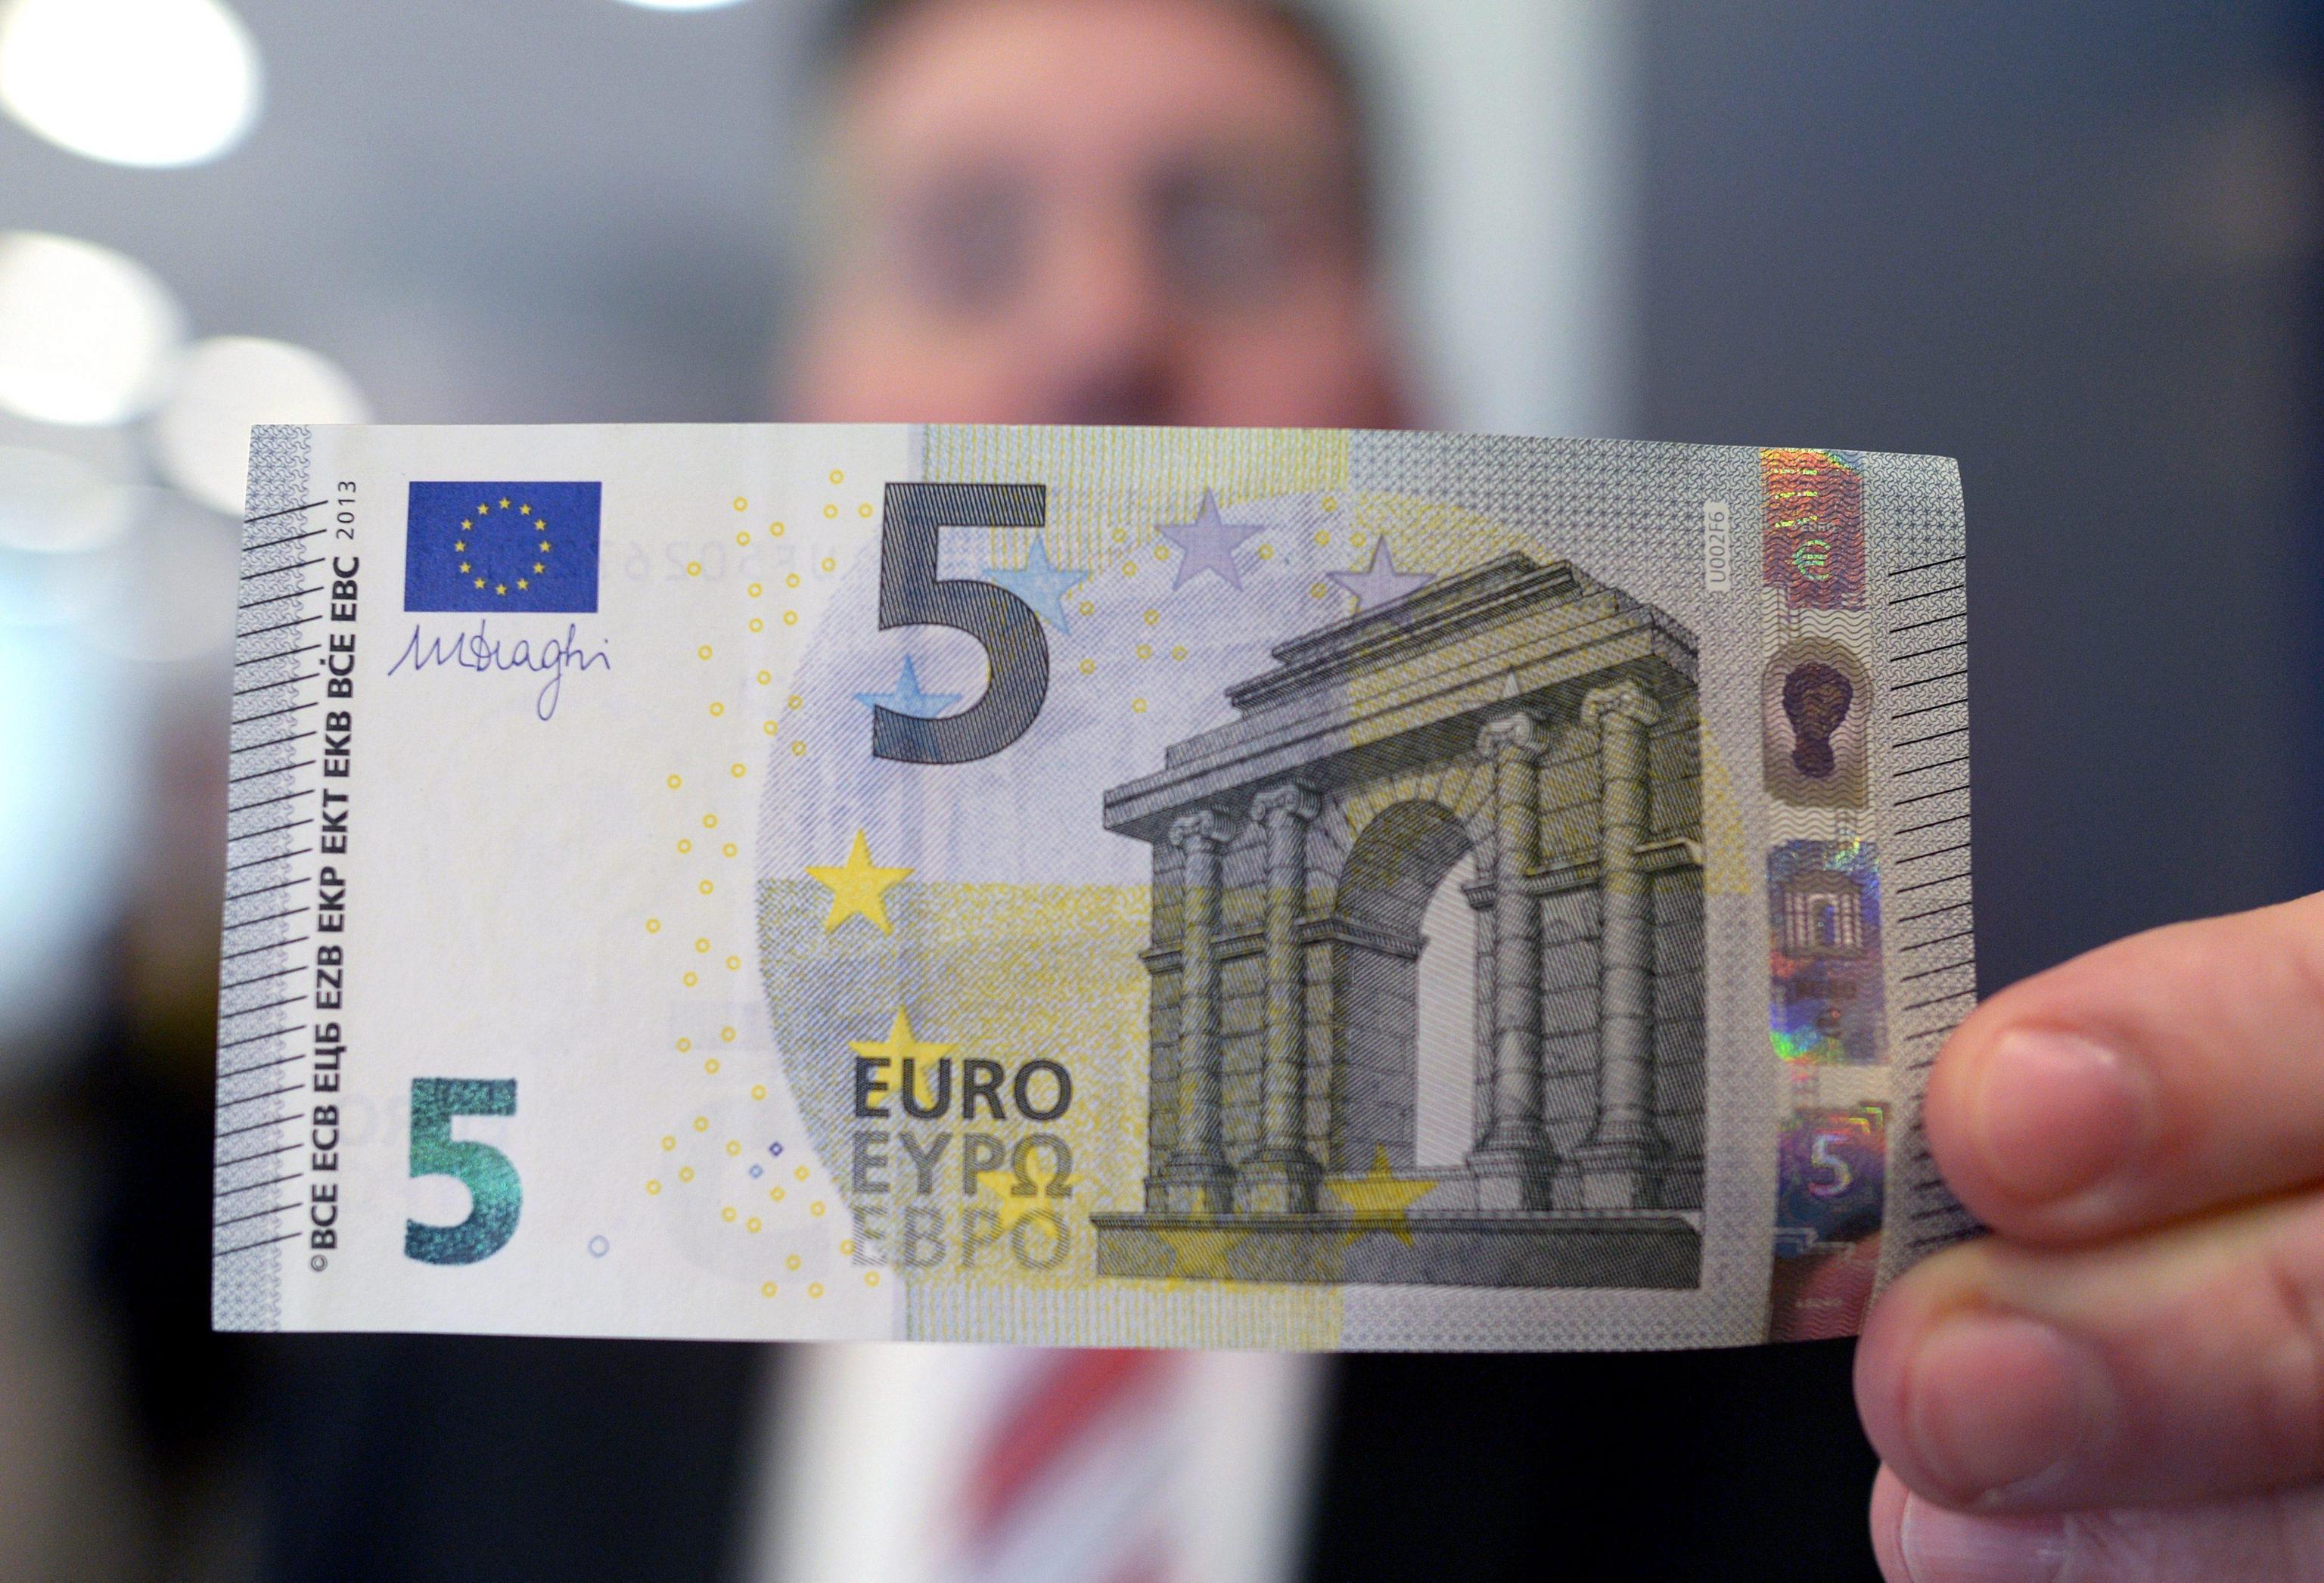 cinque euro banconota